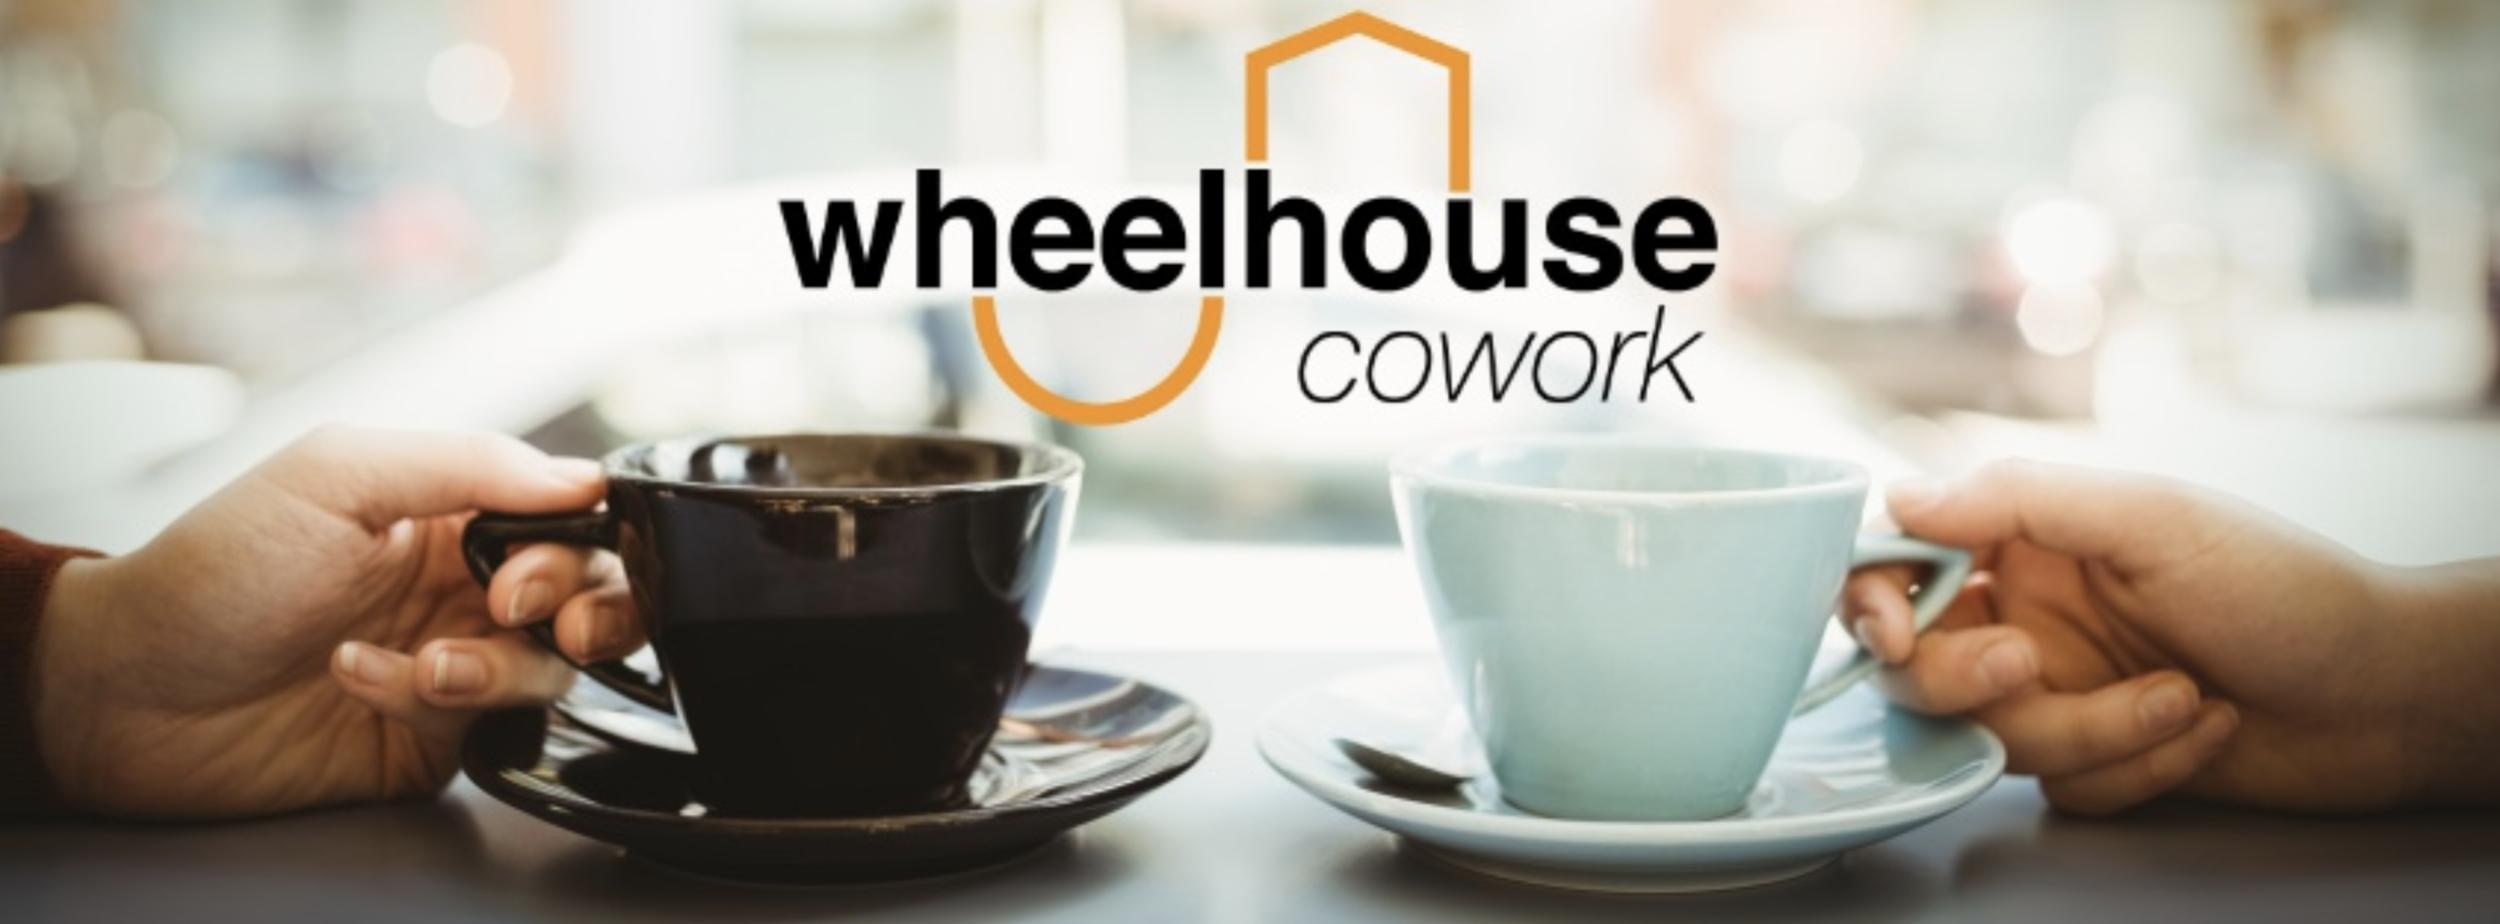 Wheelhouse Cowork